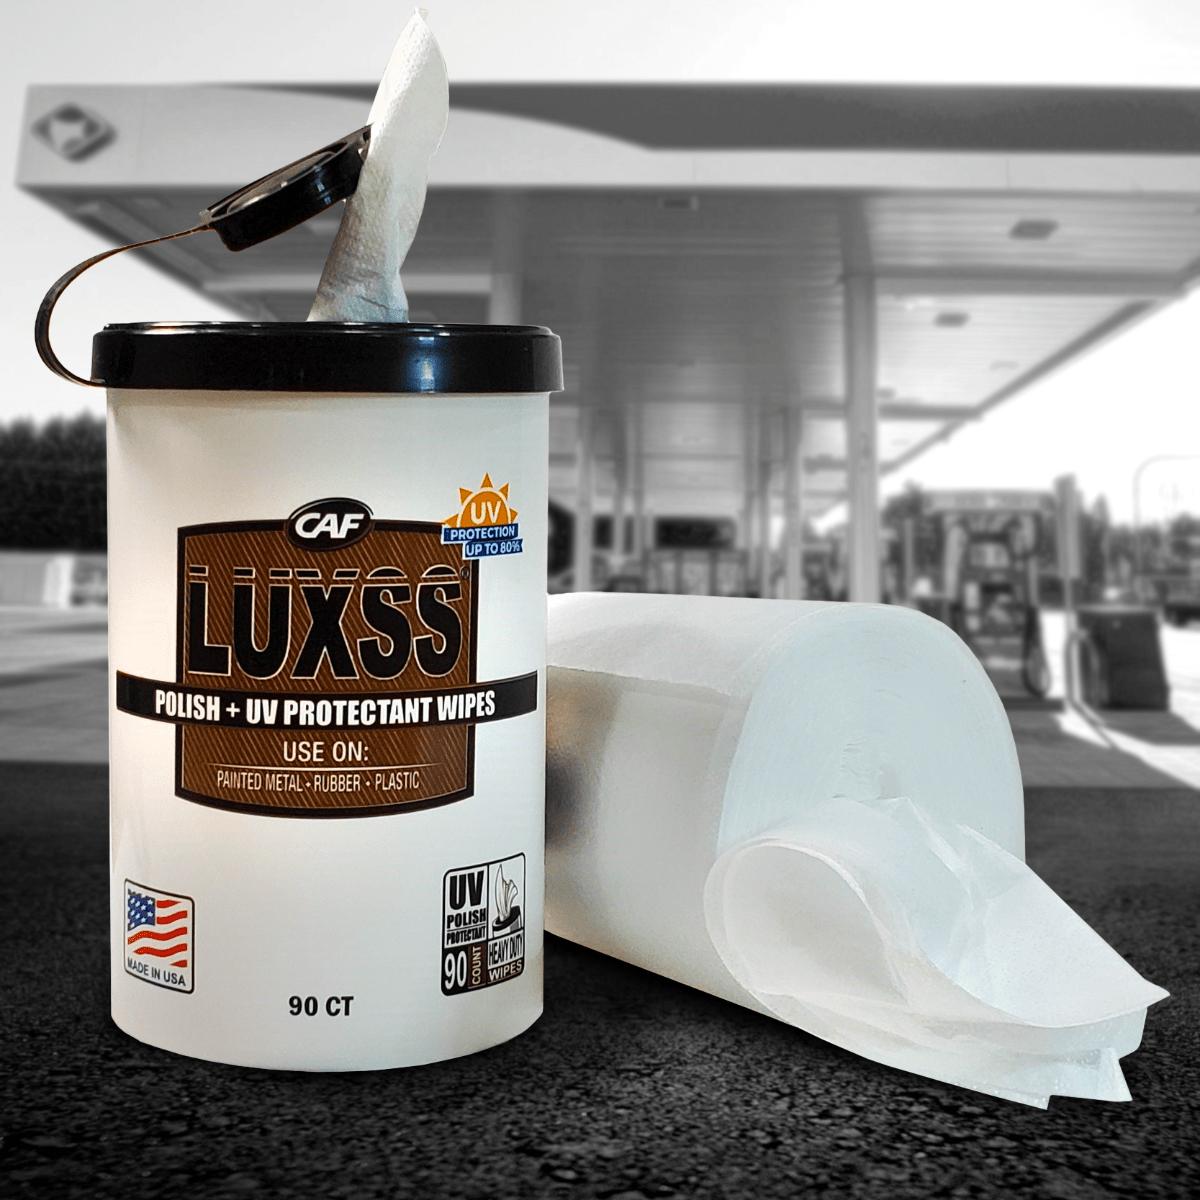 luxss polish uv protectant wipes